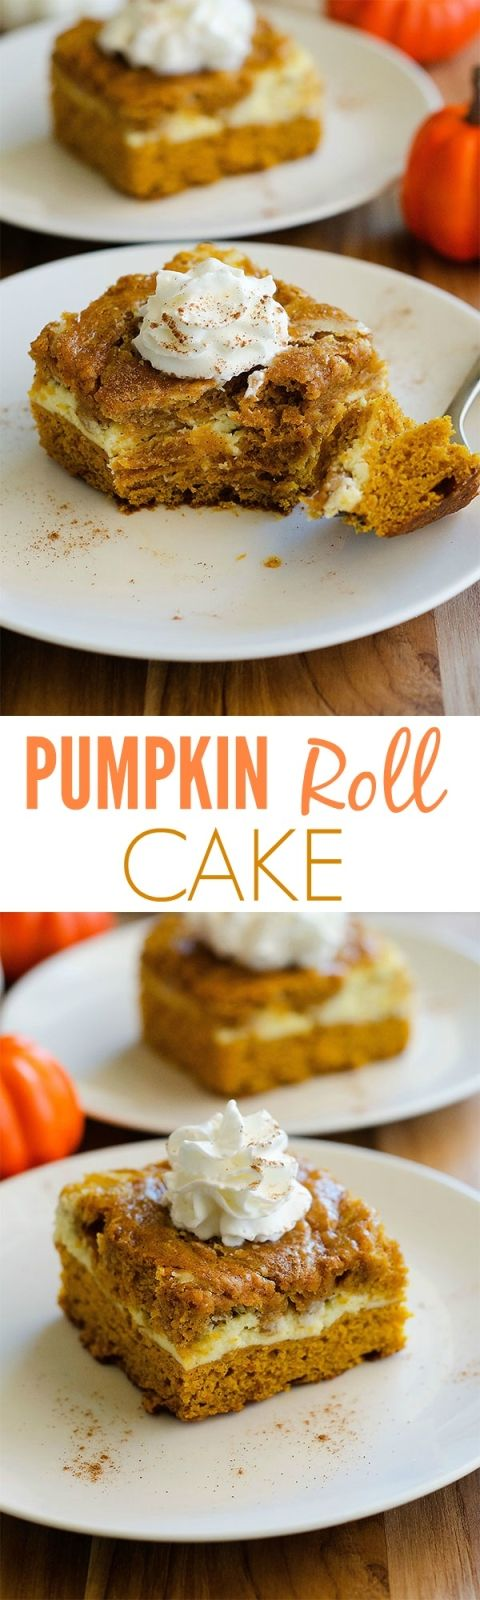 Pumpkin_Roll_Cake_PIN